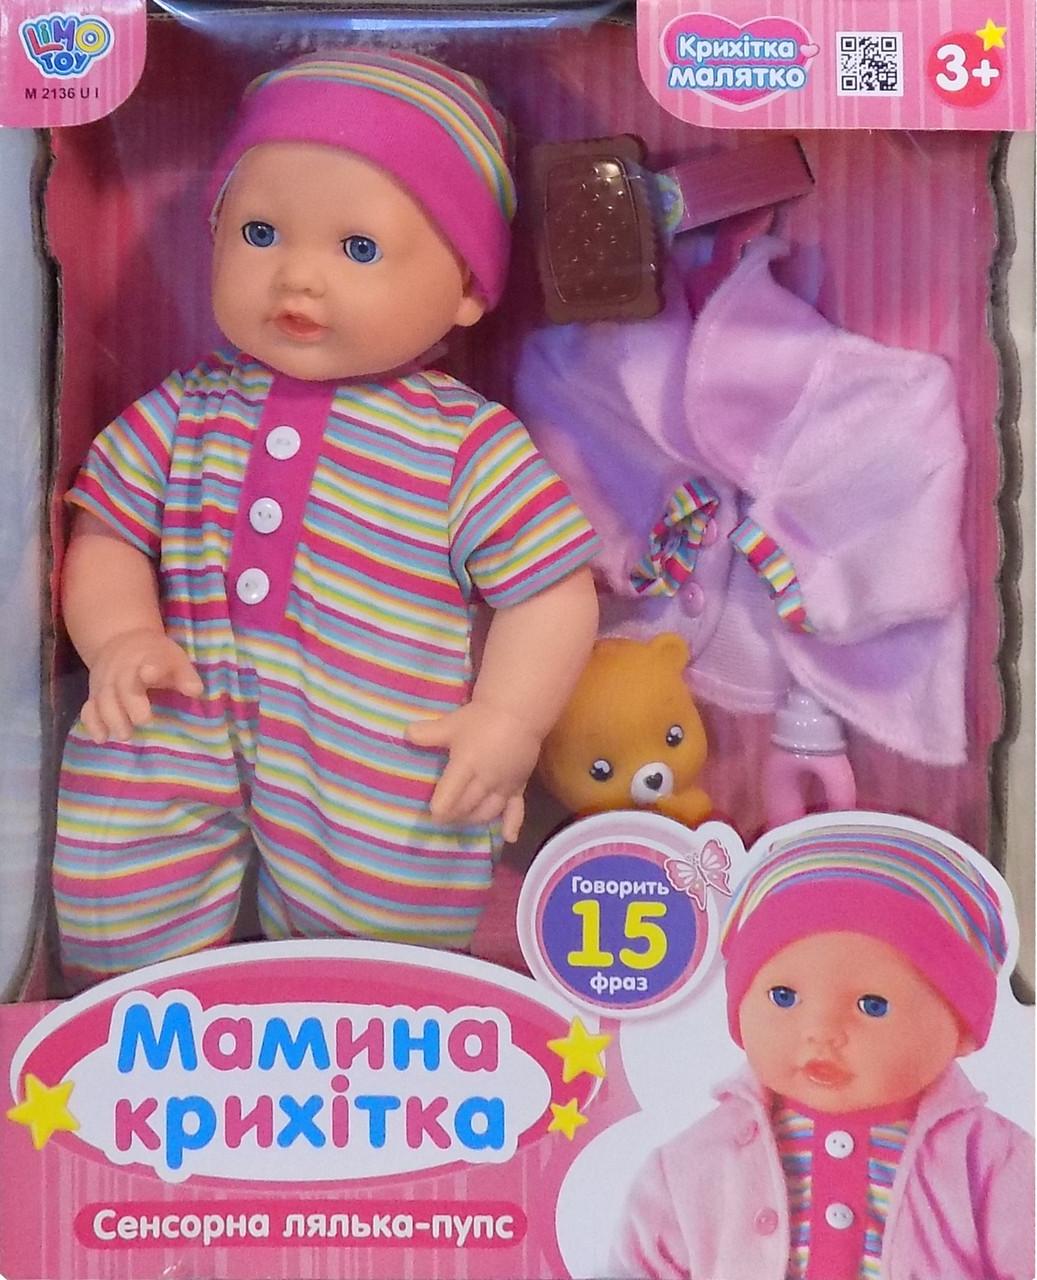 Мамина крихітка baby born Беби борн пупс